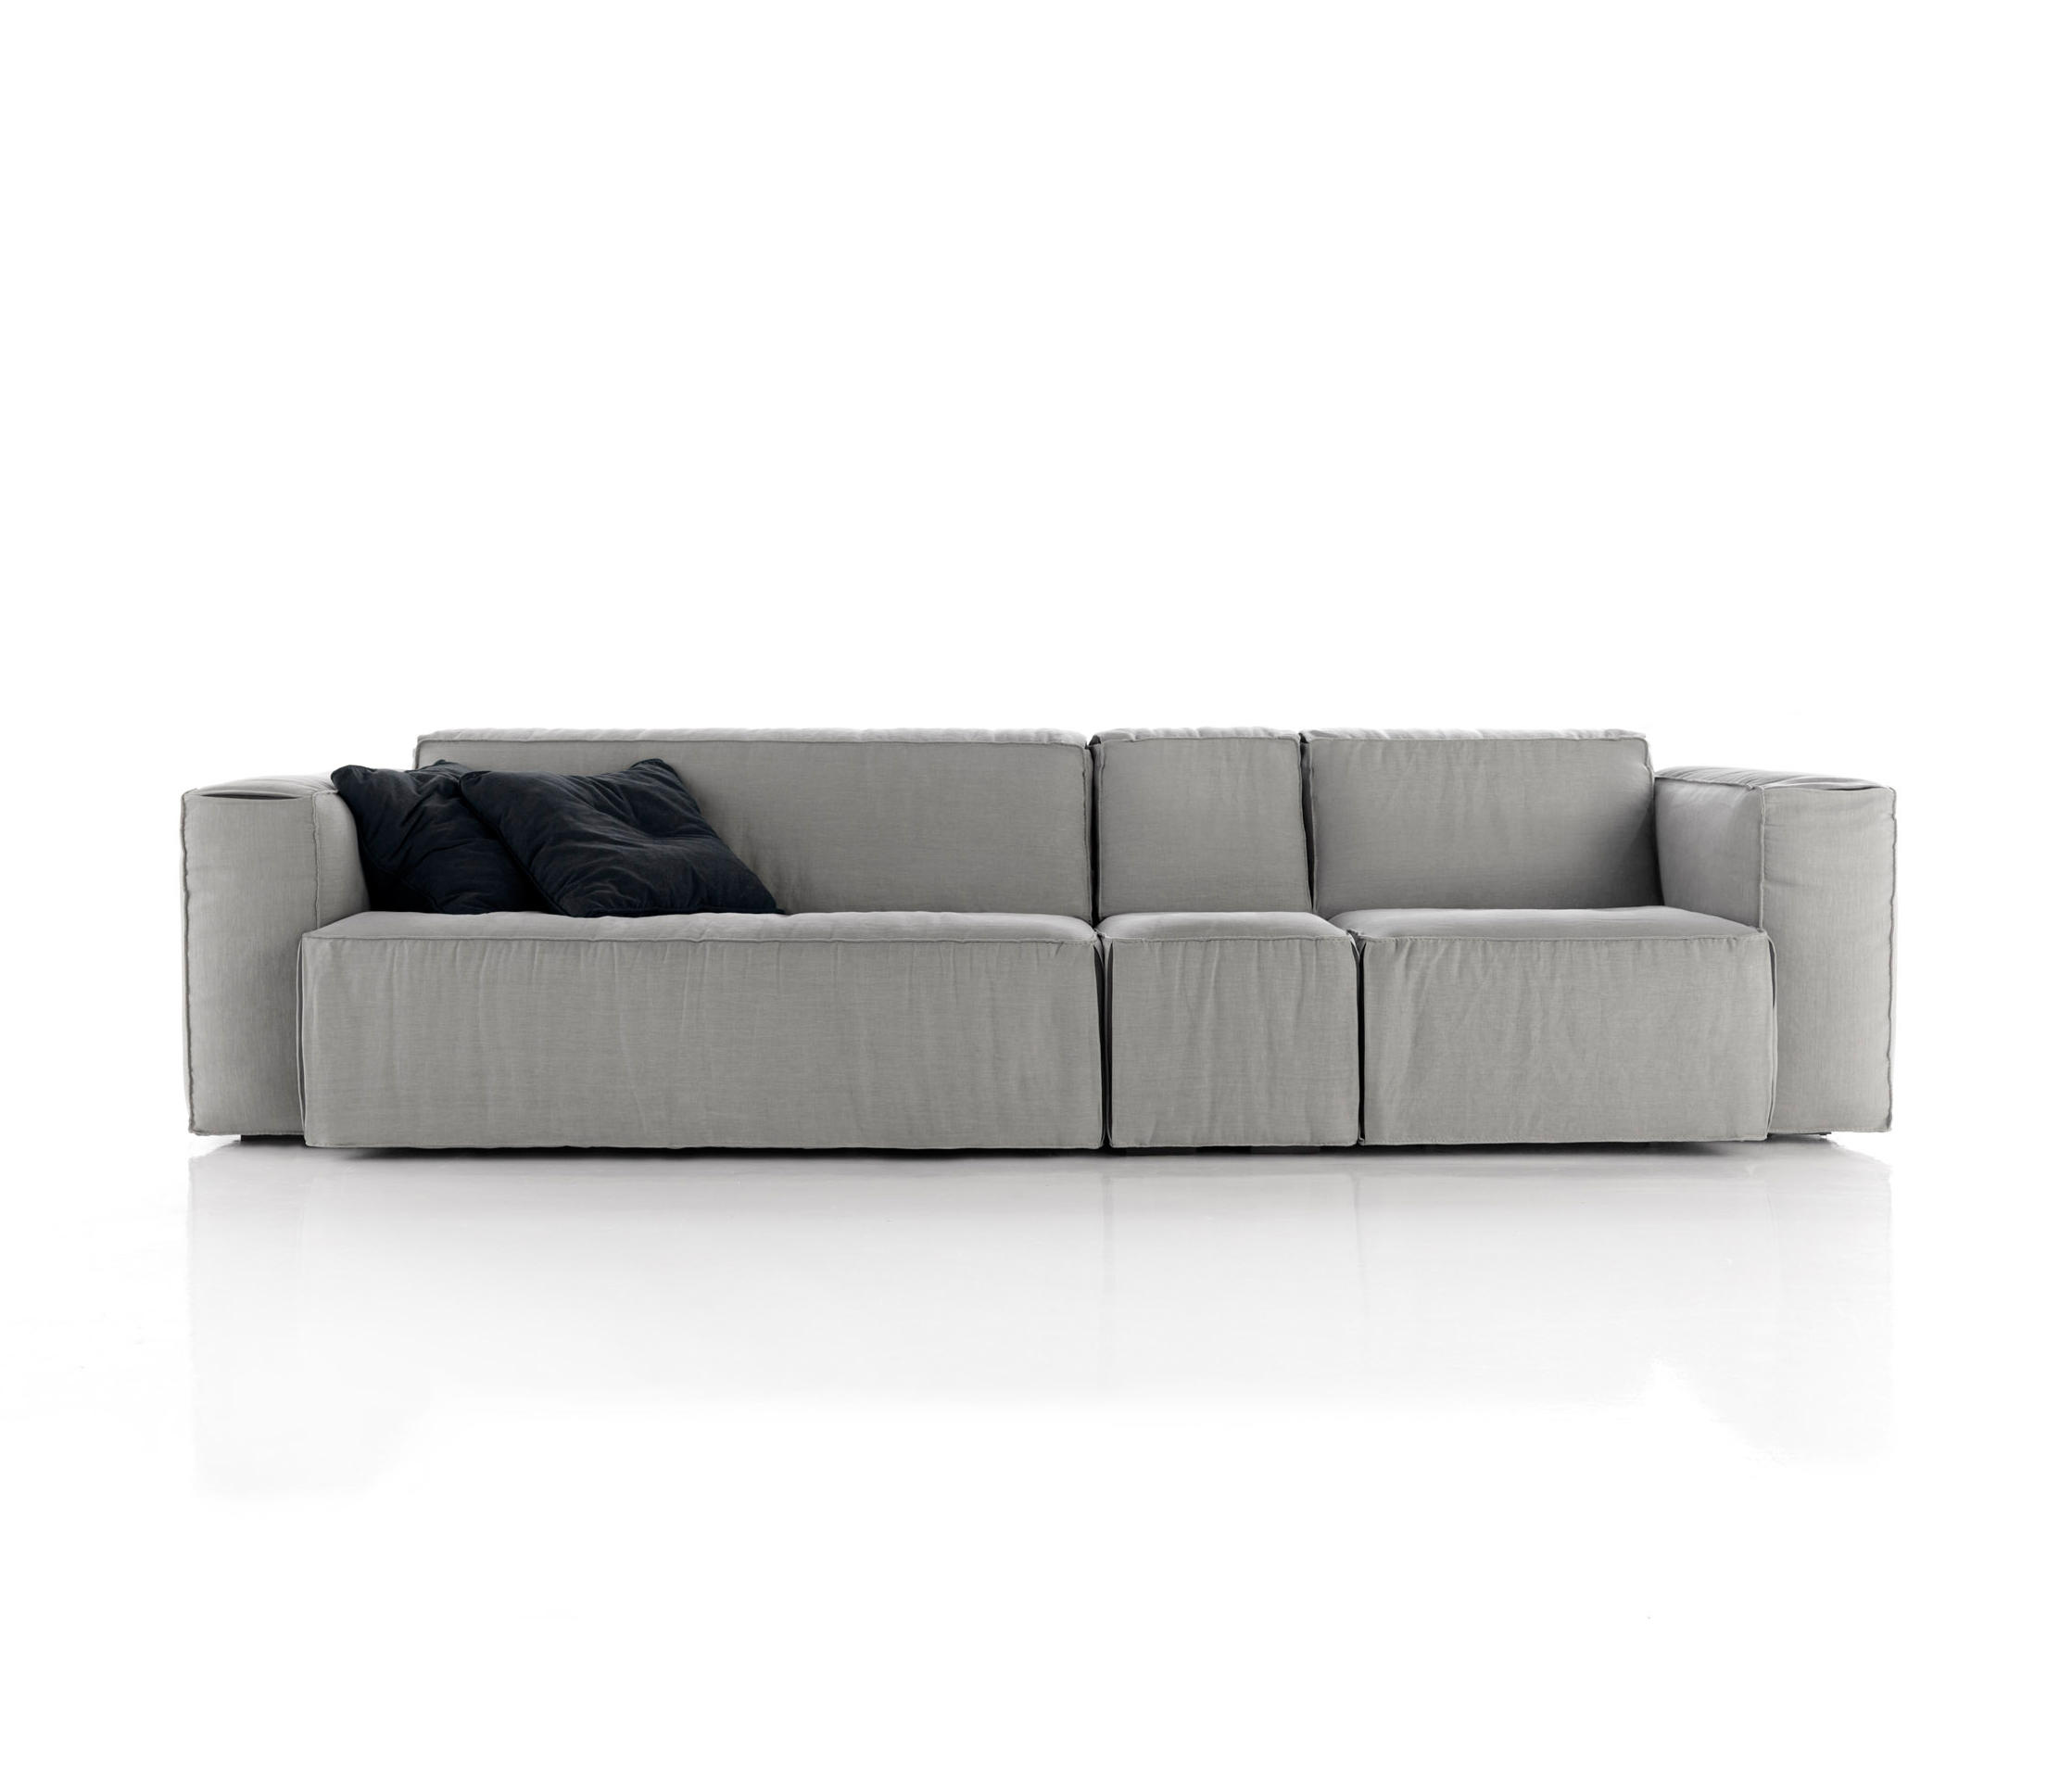 Soft Sofa By Koo International · Soft Sofa By Koo International ...